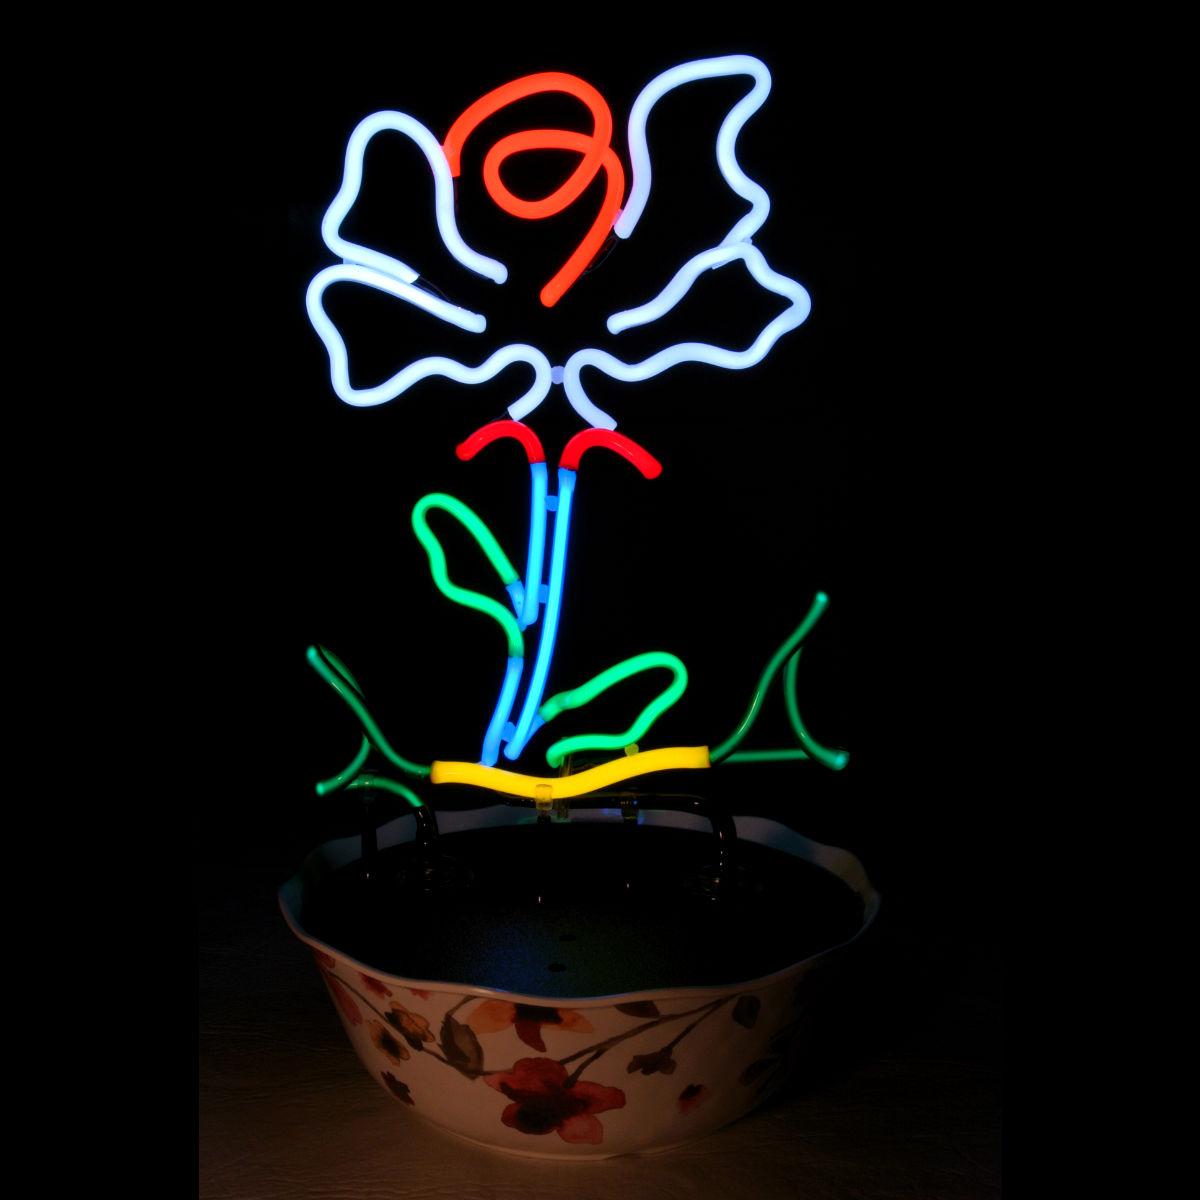 Designer Neon Tabletop Rose Sculpture in Stained Murano Italian Neon Glass by John Barton